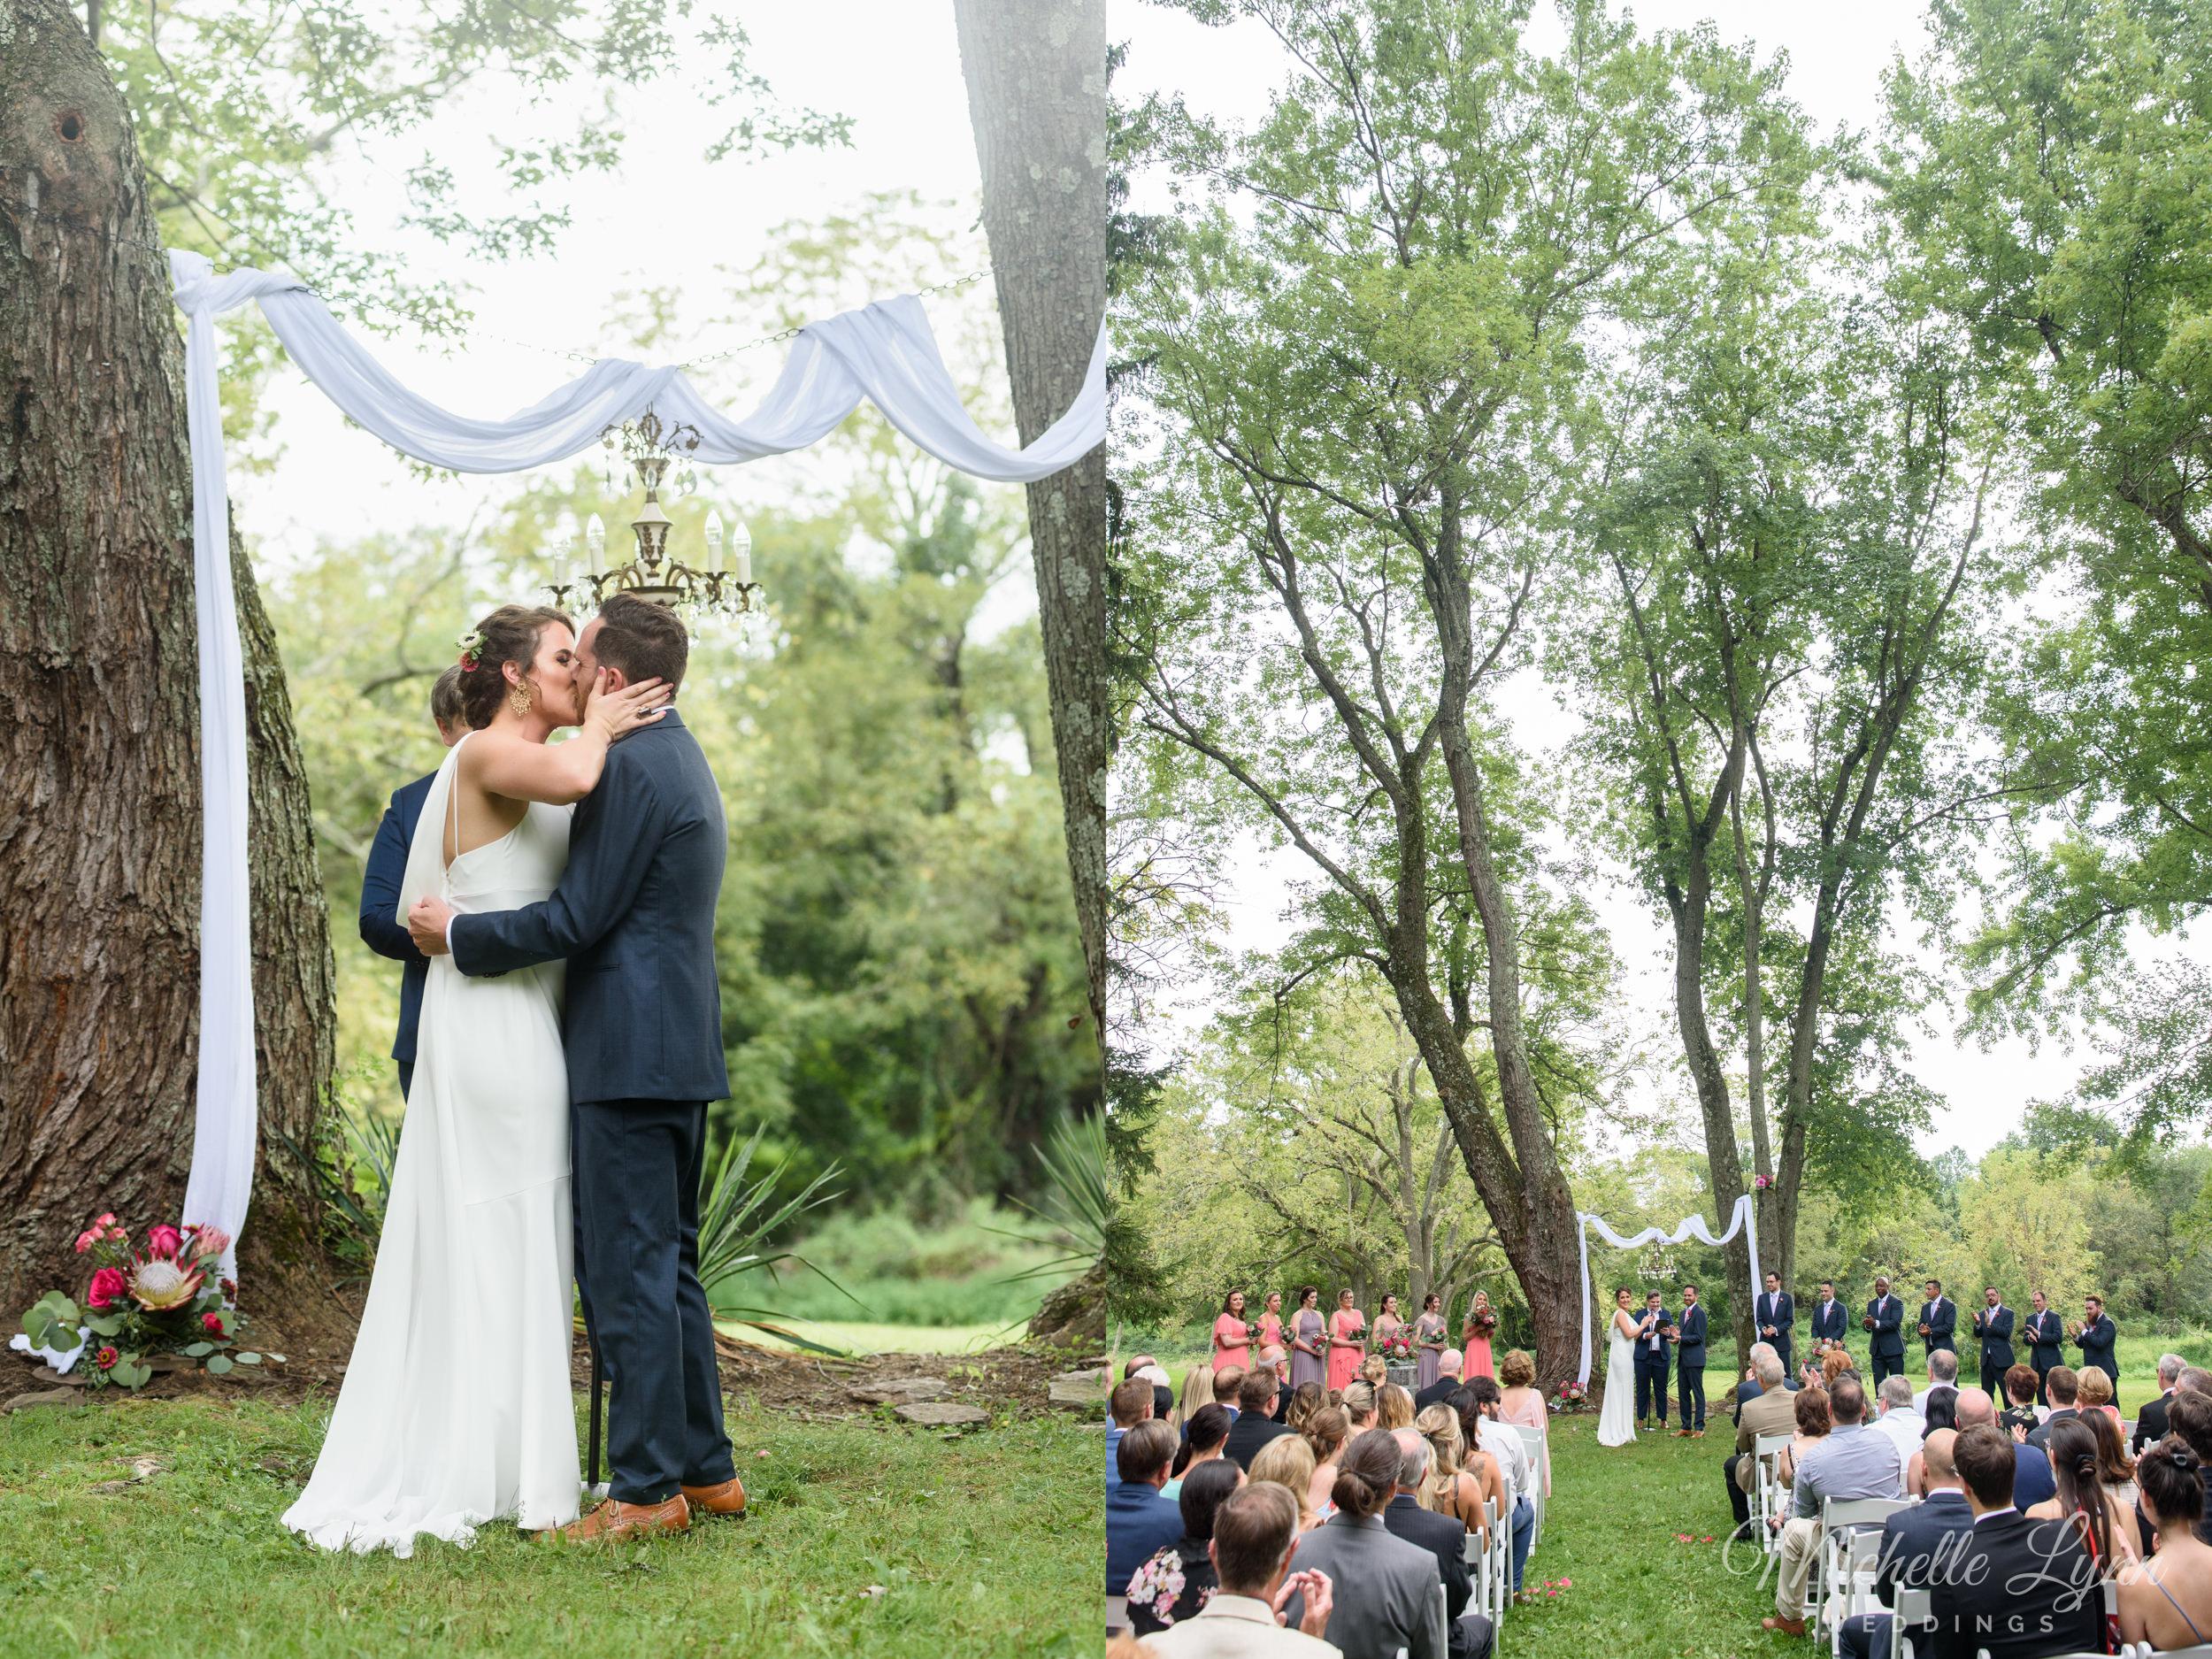 mlw-unionville-vineyards-nj-wedding-photography-45.jpg